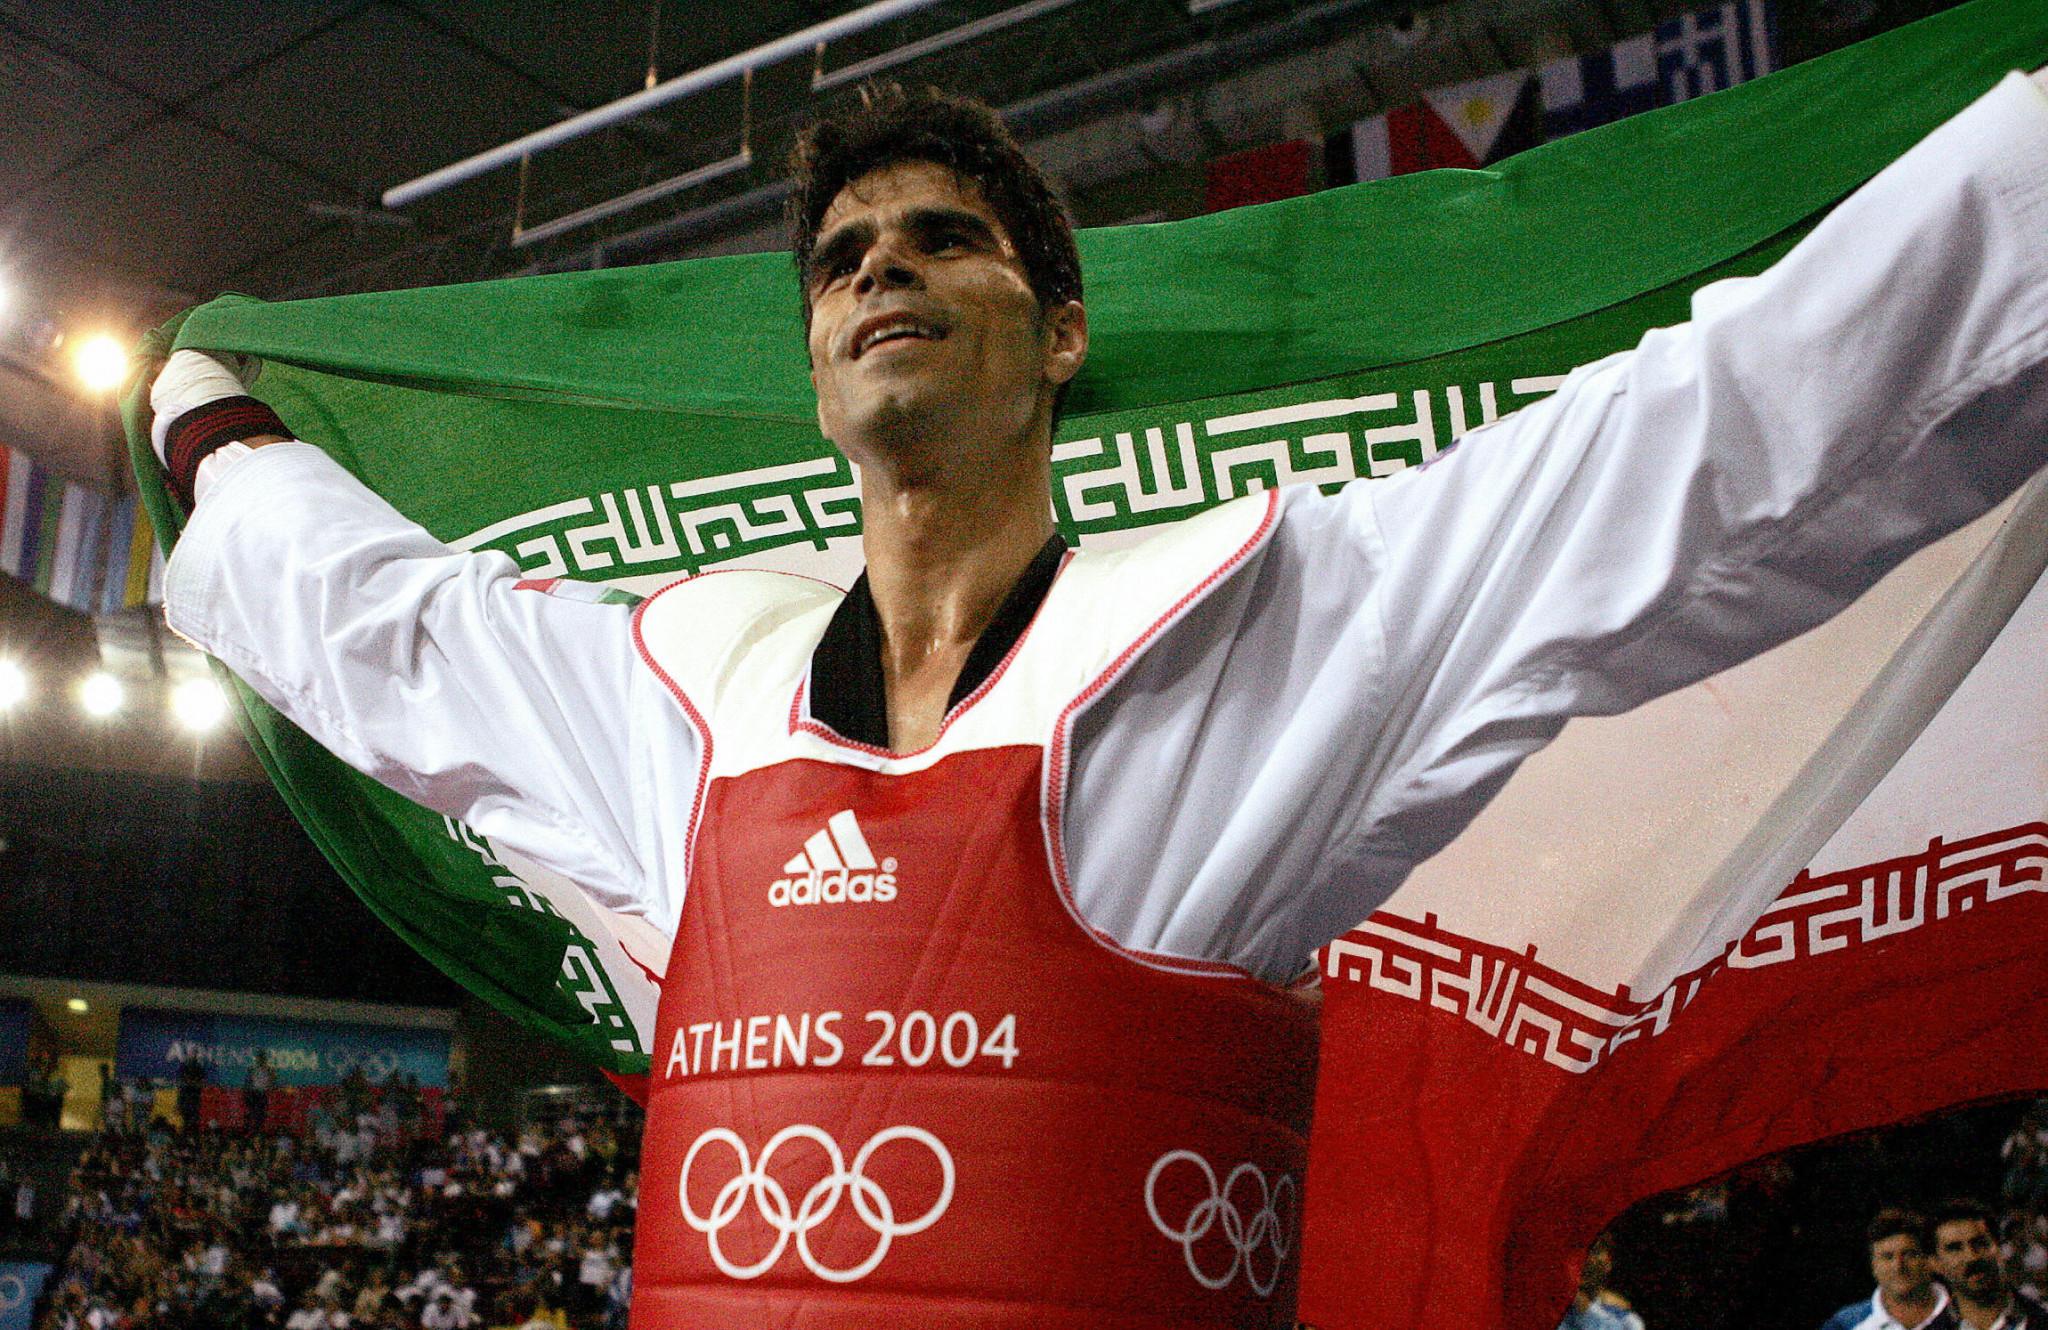 Two-time Olympic taekwondo champion Saei elected Iran NOC Athletes' Commission chairman